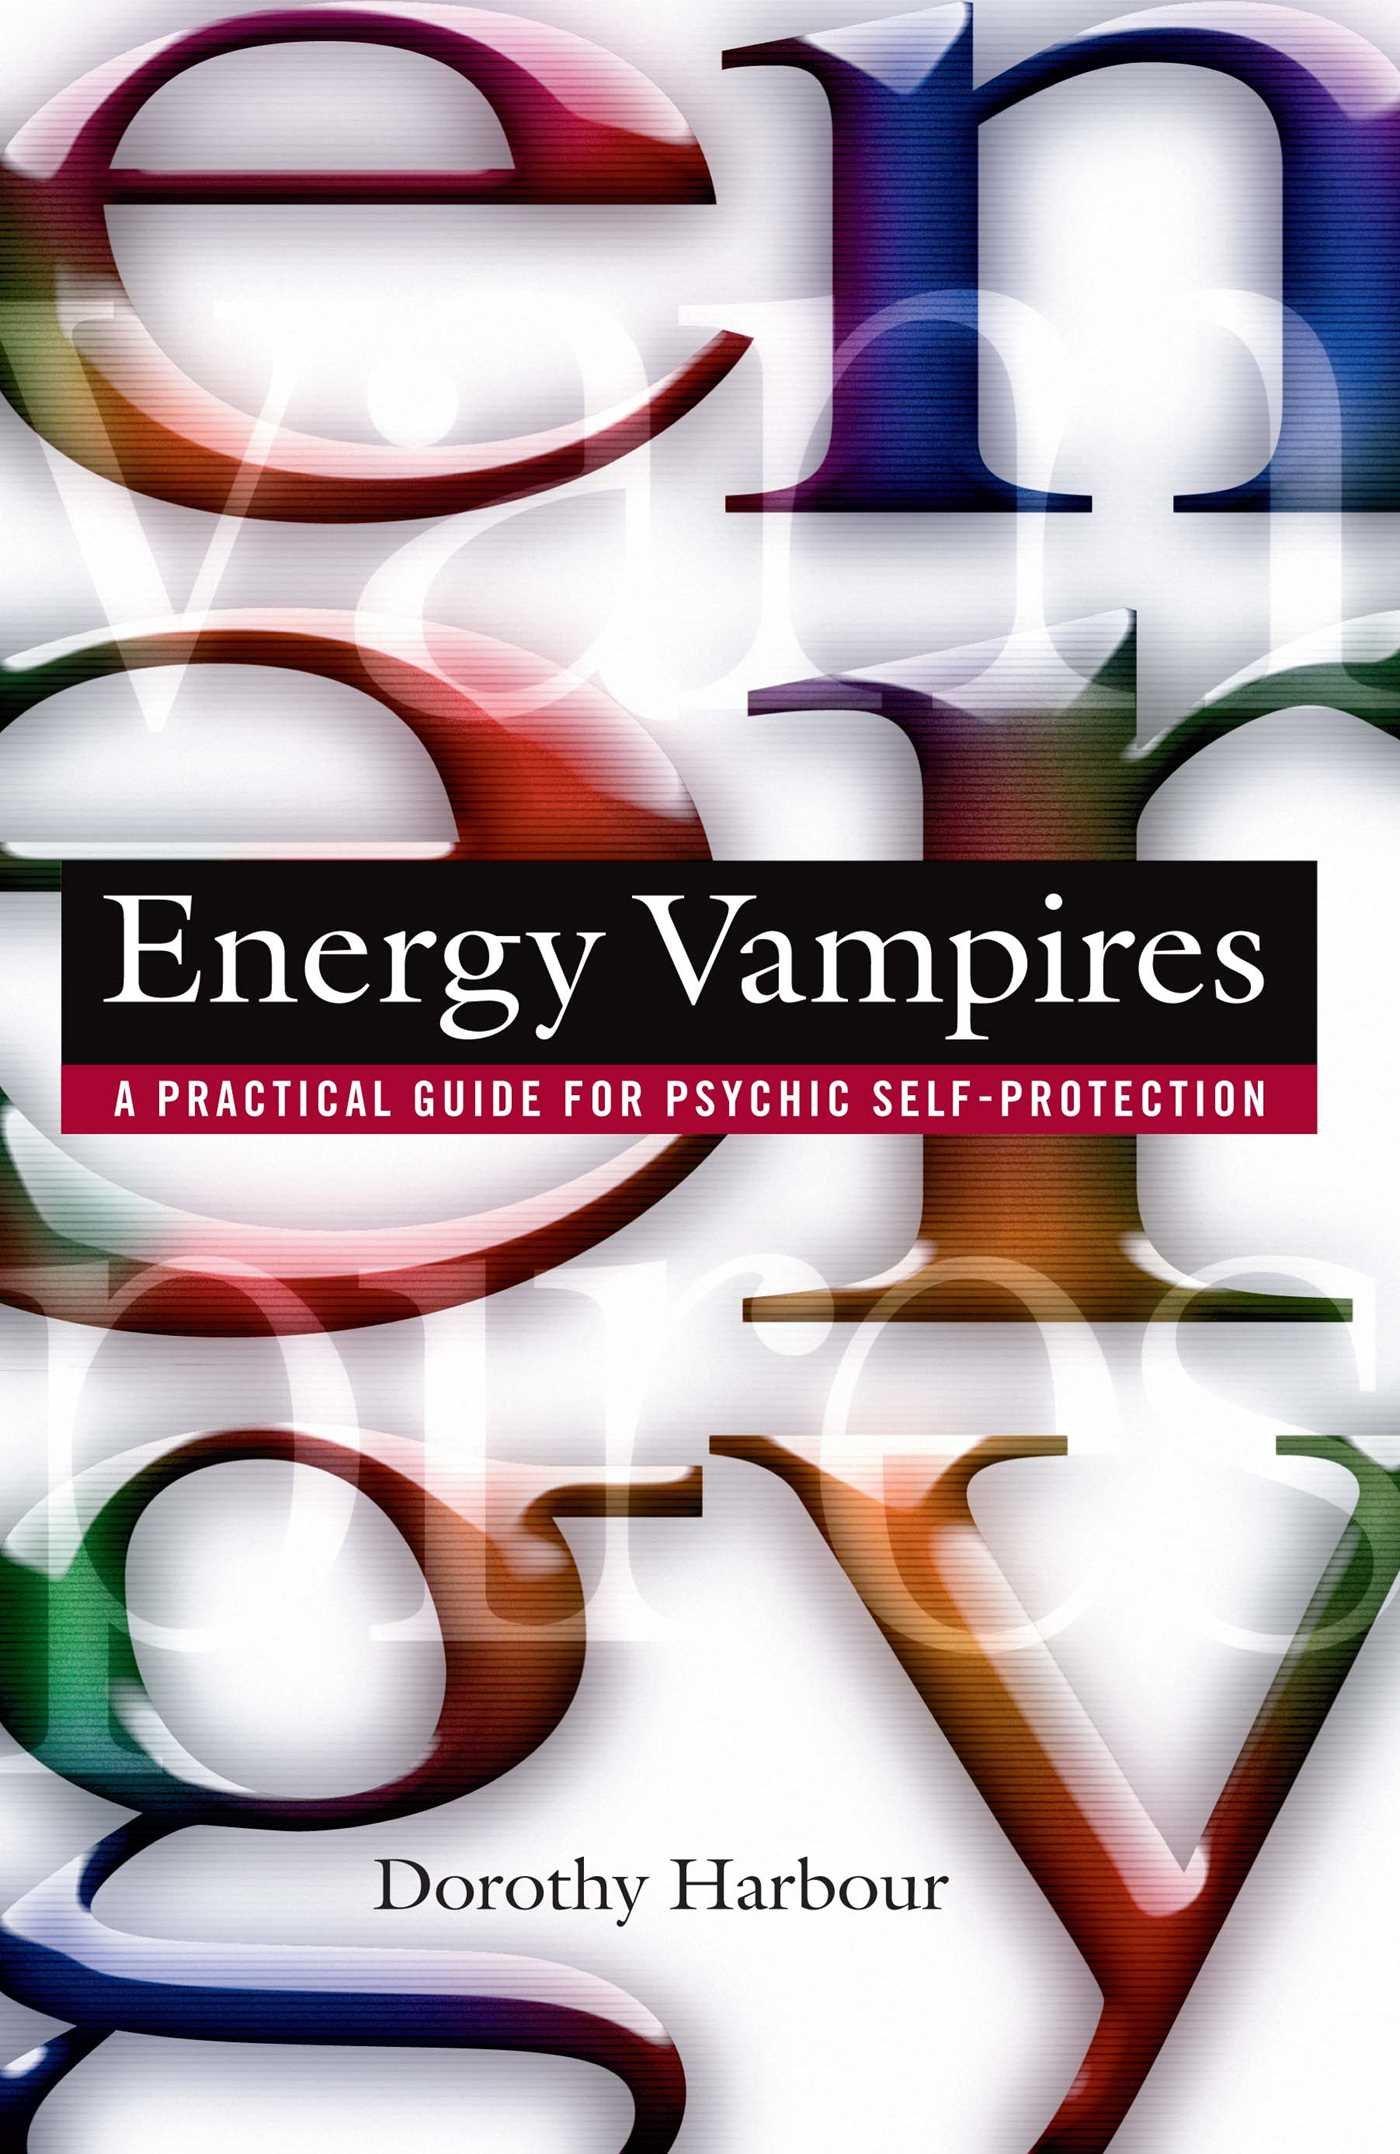 amazon com energy vampires a practical guide for psychic self rh amazon com